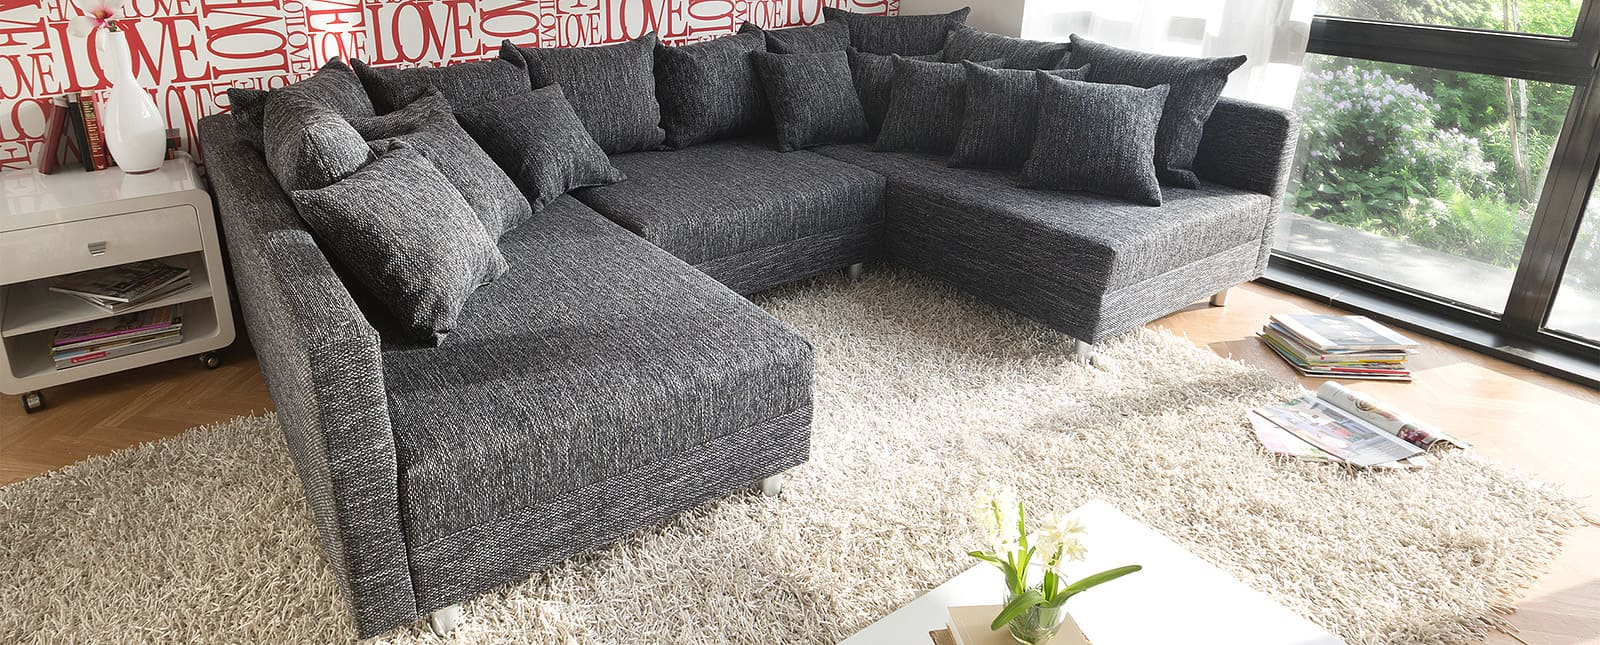 sofaserie clovis modulsofa infos pflege. Black Bedroom Furniture Sets. Home Design Ideas